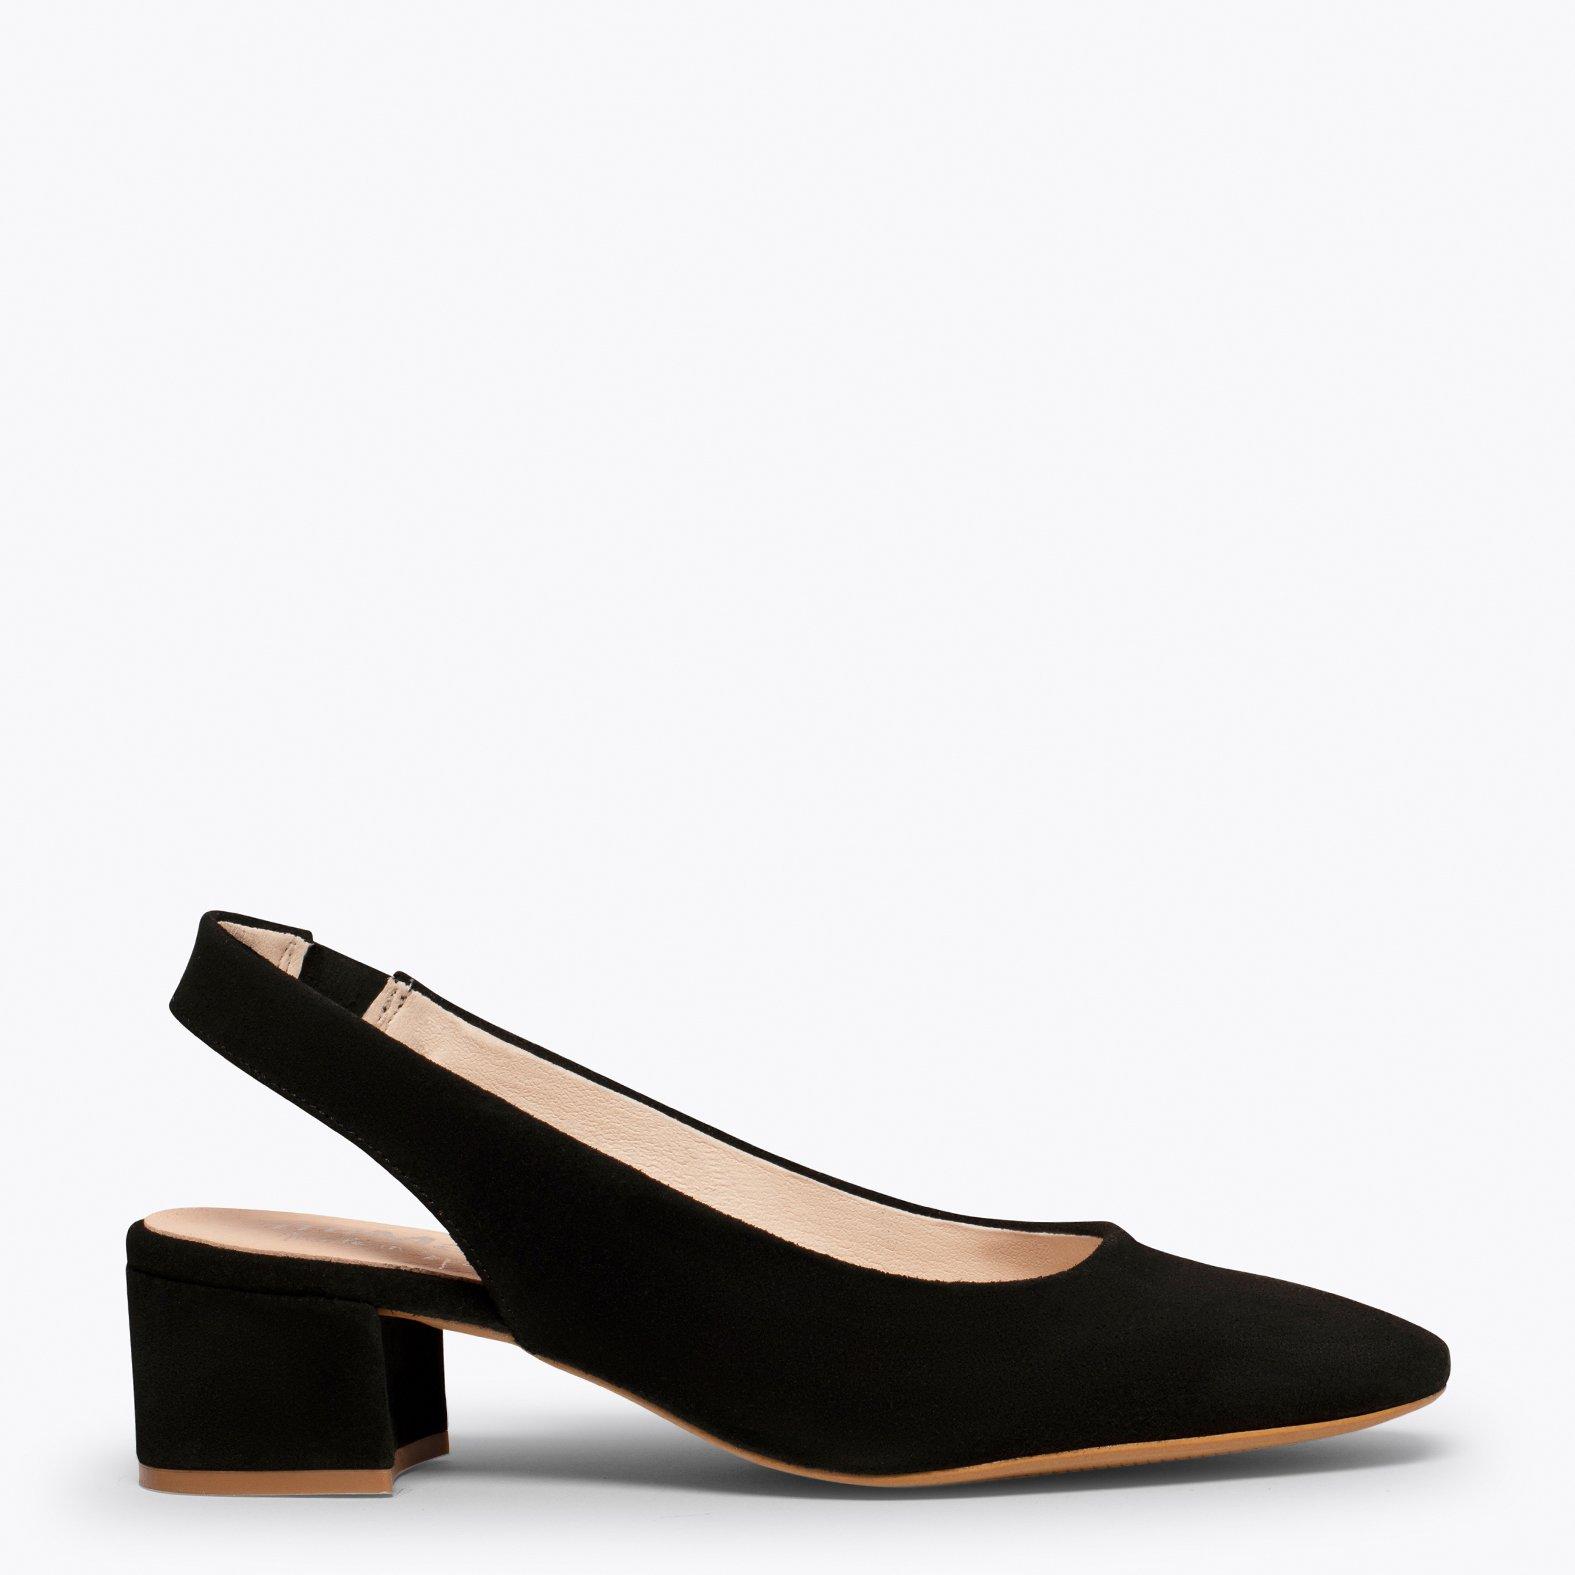 LADY Zapato destalonado con puntera cuadrada NEGRO